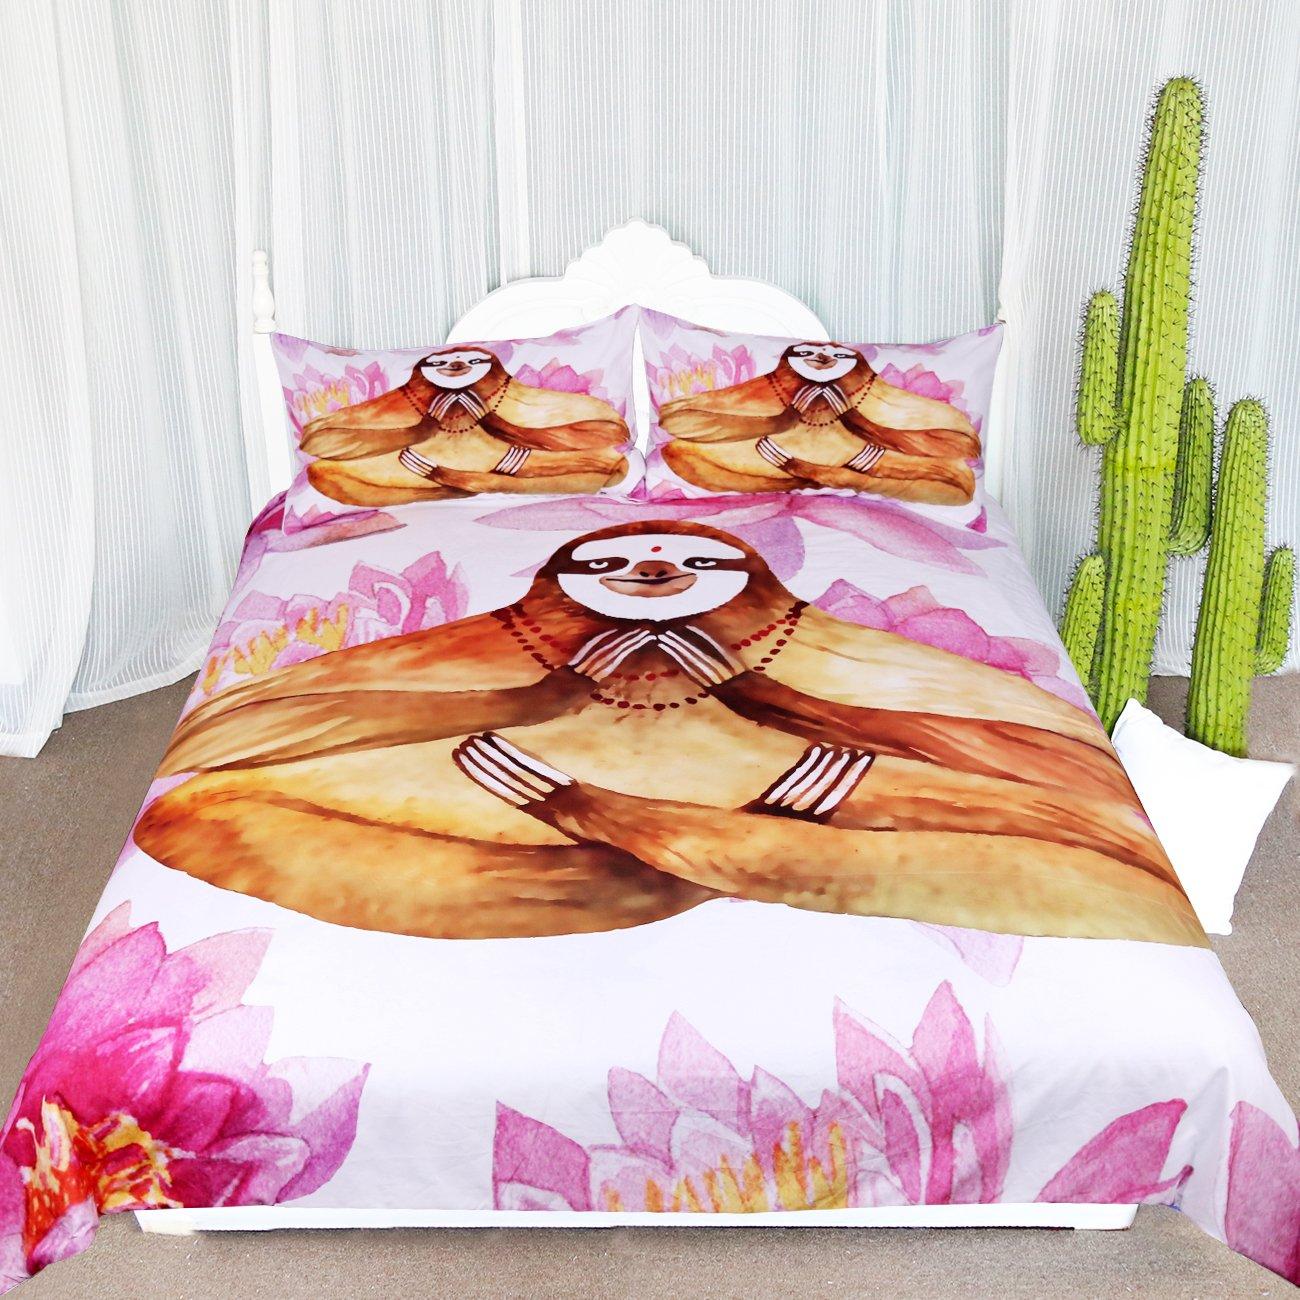 (Queen, Yoga Sloth) - Arightex Watercolour Yoga Sloth Duvet Set 3 Pieces Pink Lotus Brown Sloth Meditation Bedding Girly Duvet Cover (Queen) B076XZ5YG6  クイーン